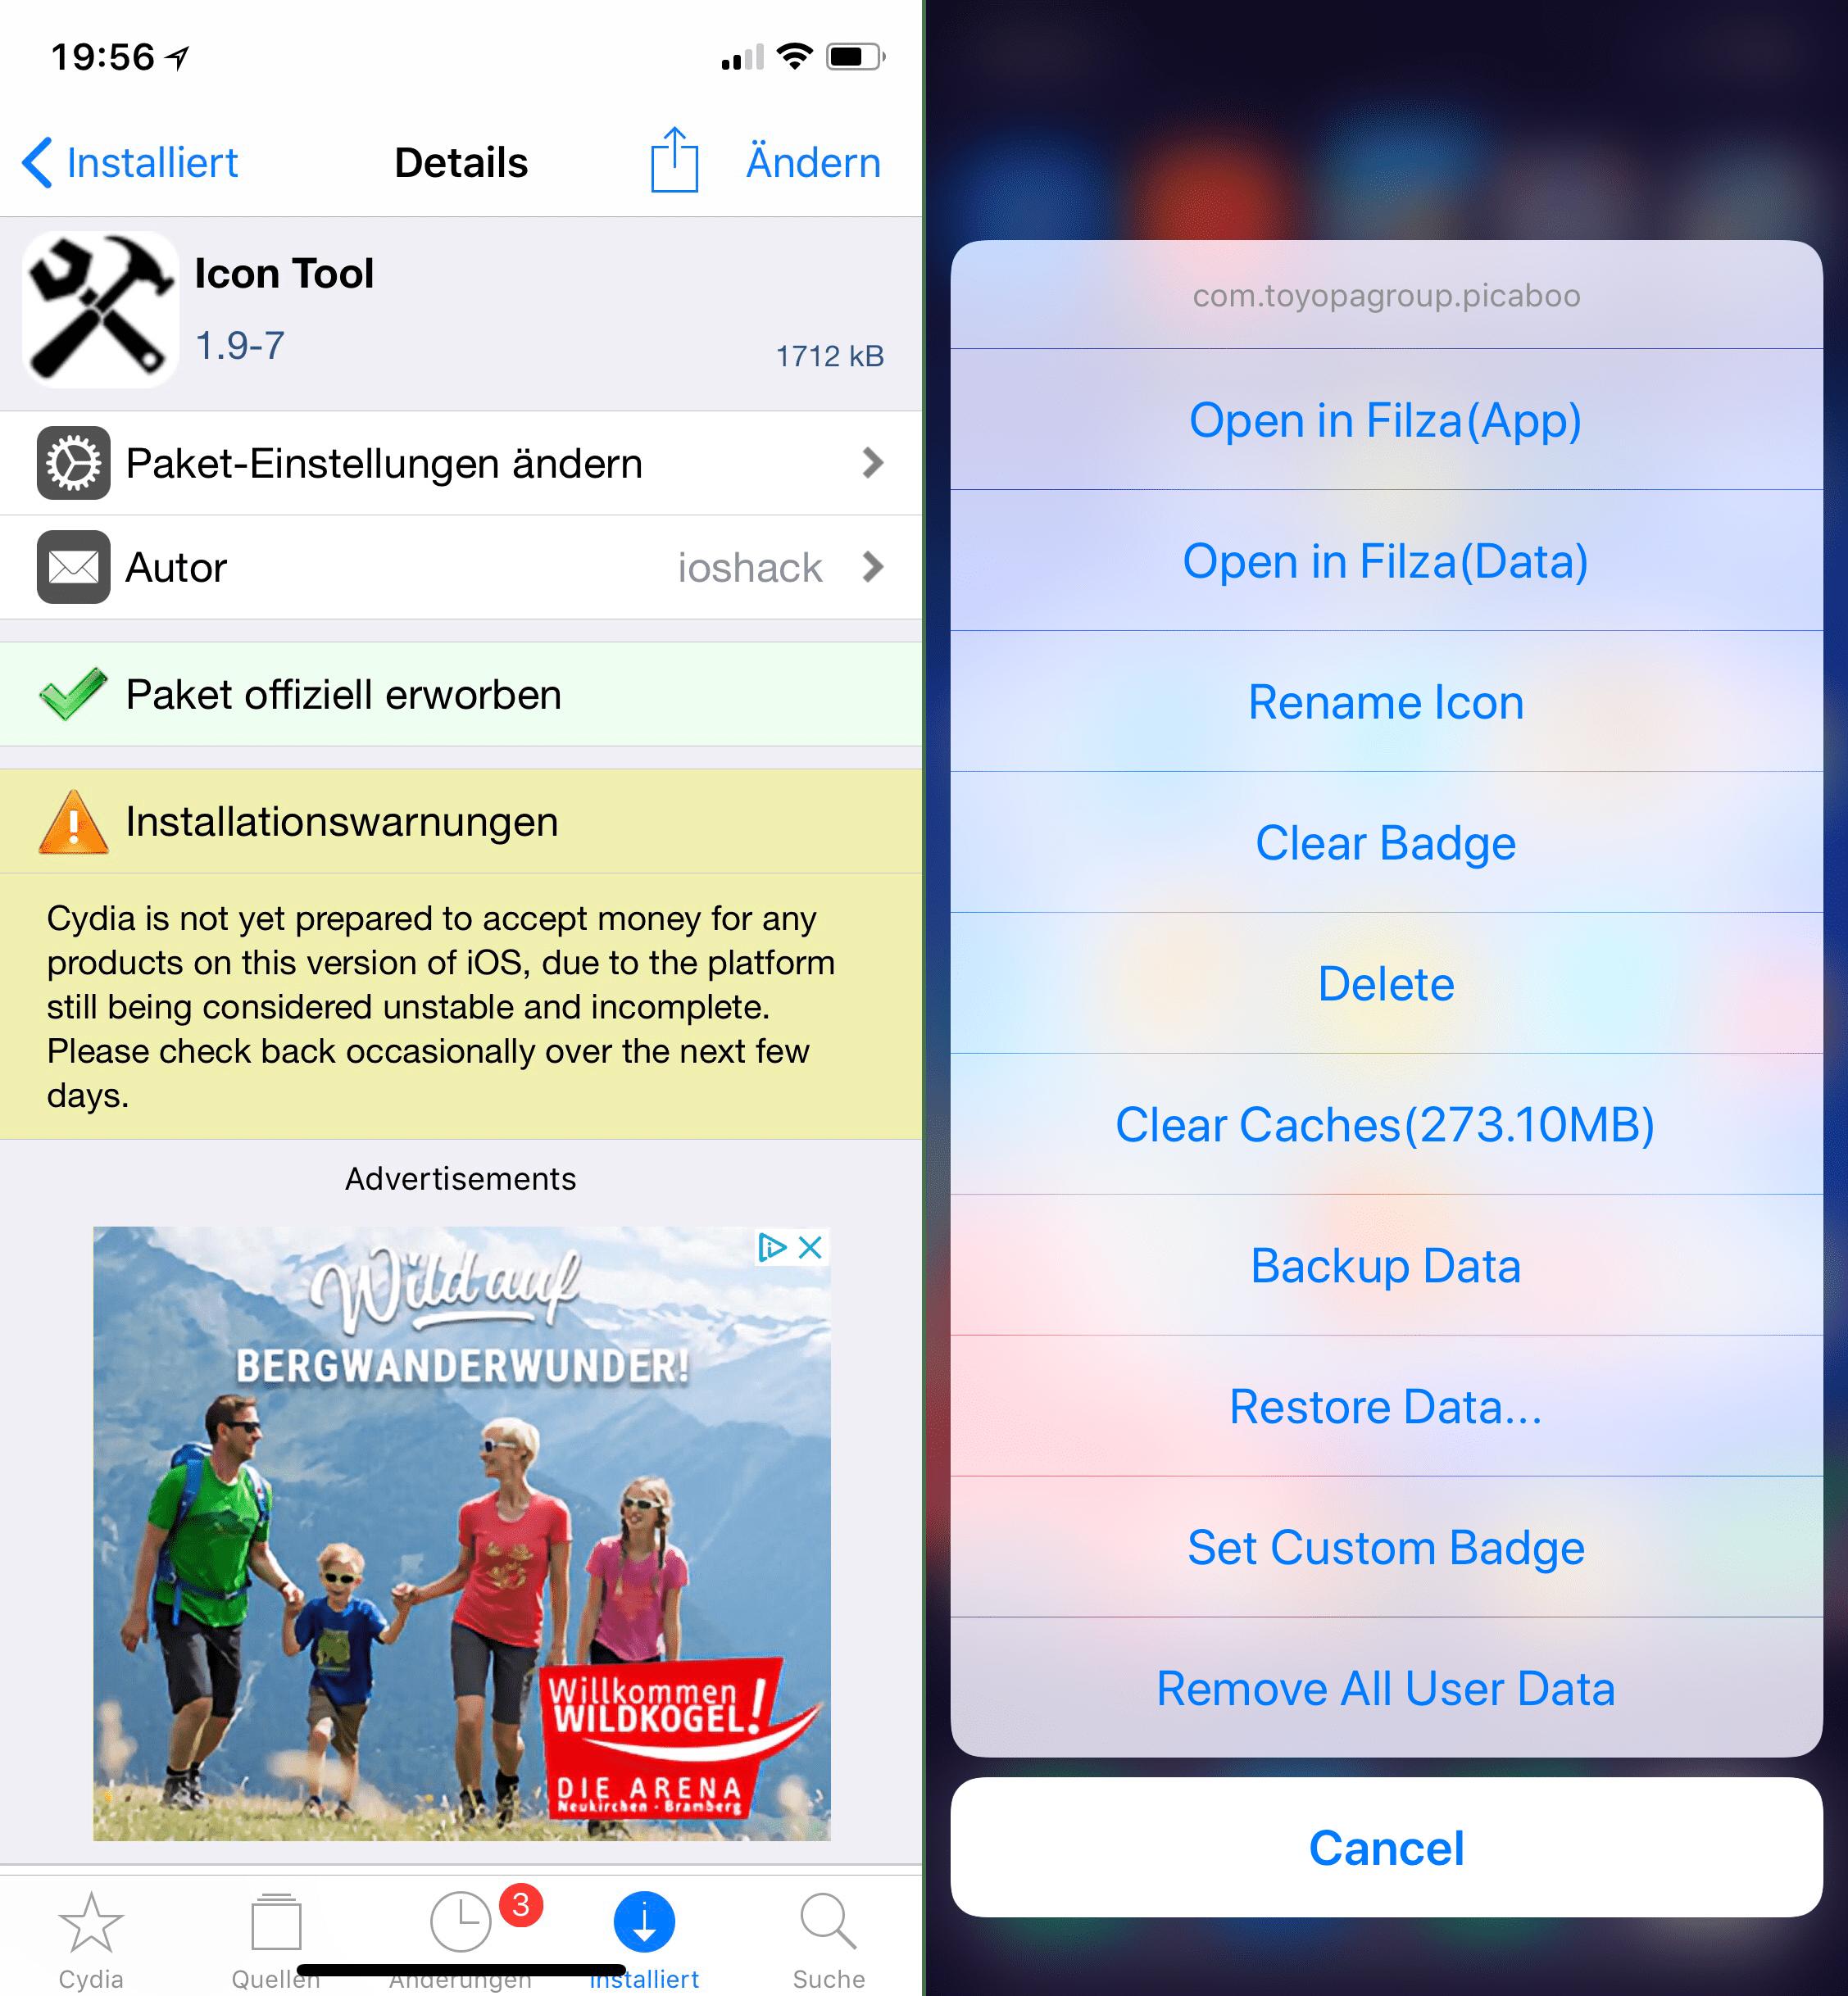 Apps in Filza öffnen, Cache leeren & mehr, Top, Cydia, Tweaks, Ausgabe 3, IconTool, Hack4Life, Fabian Geissler